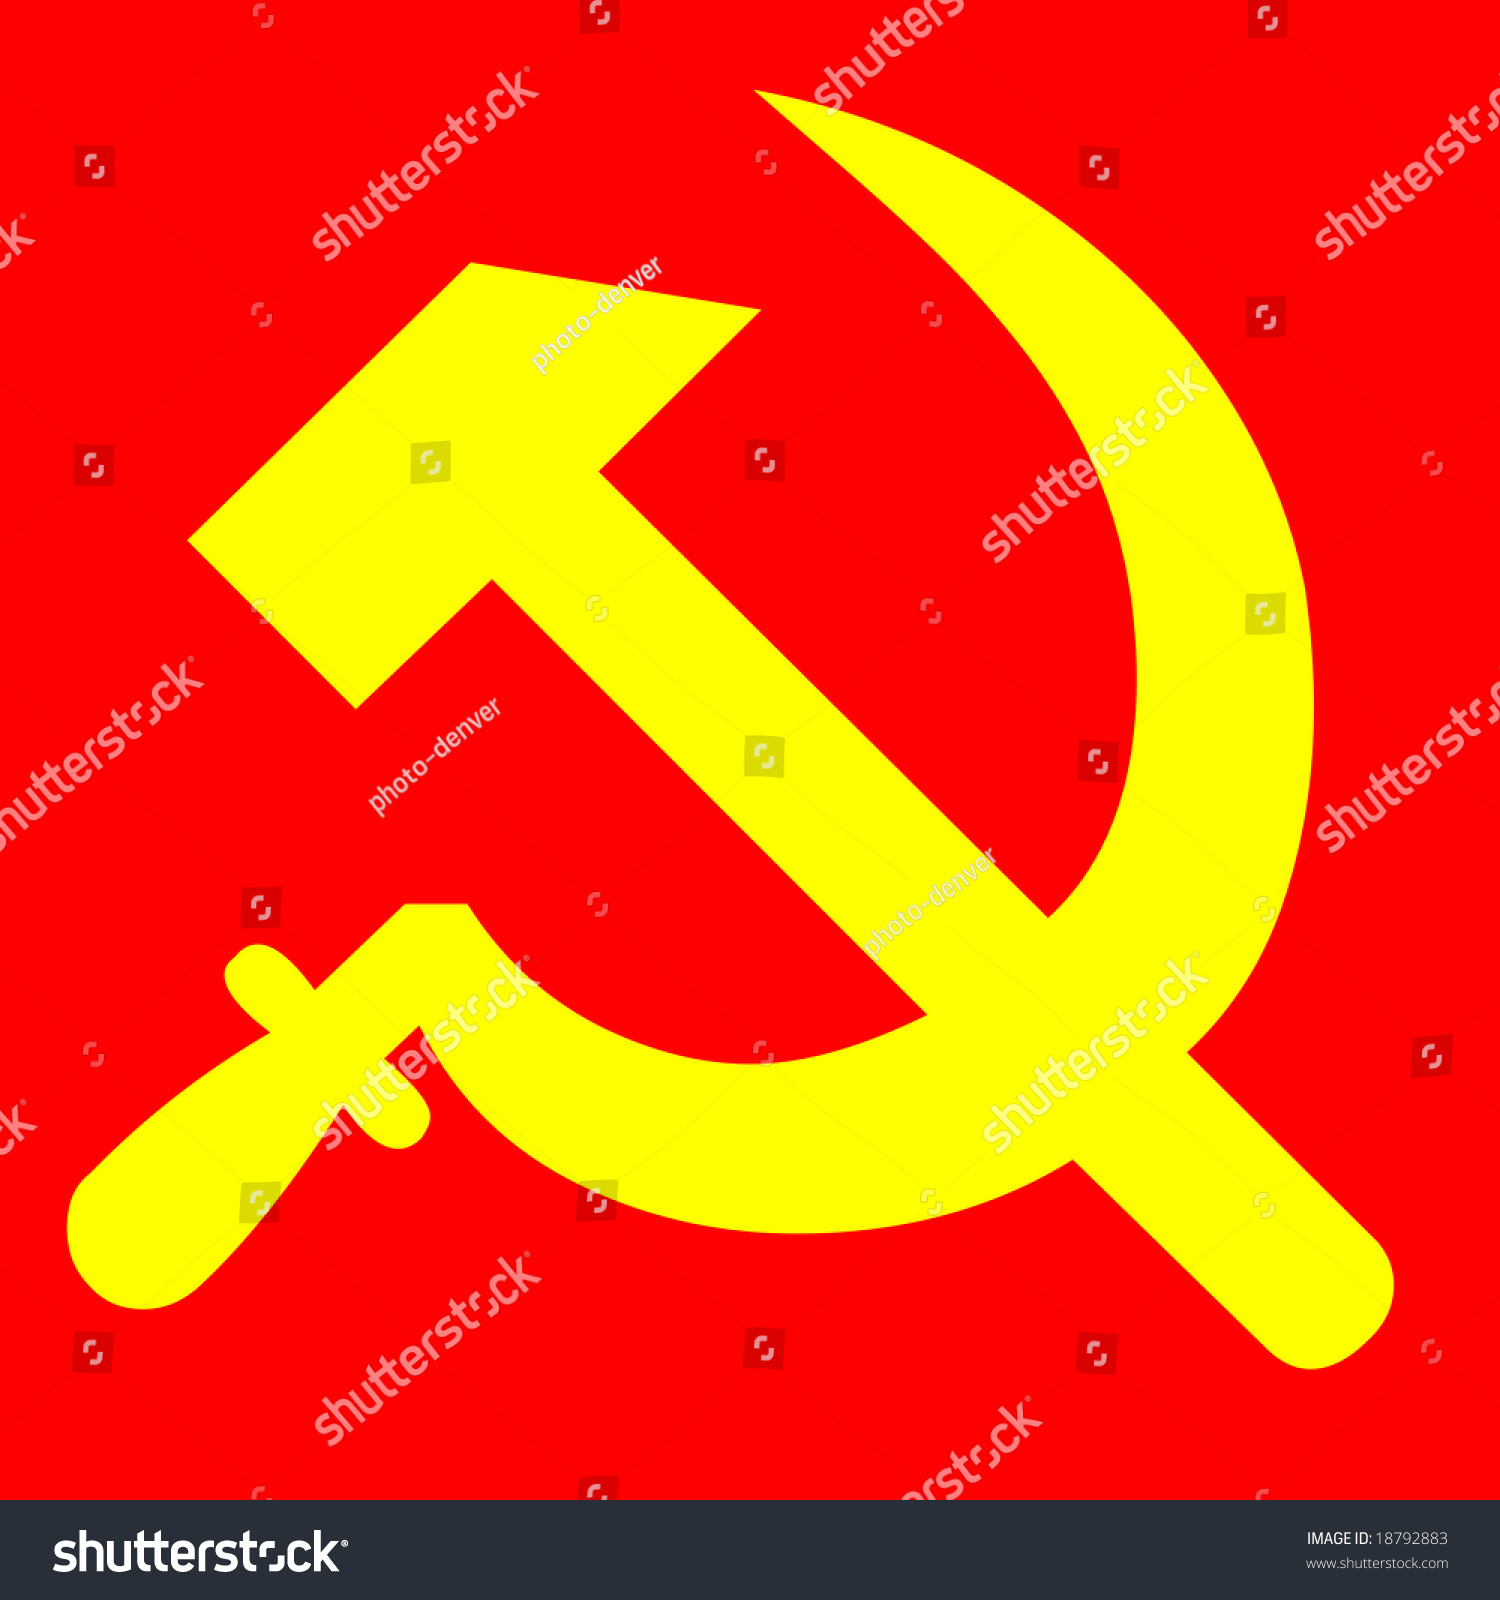 Communism symbol hammer sickle stock illustration 18792883 communism symbol hammer and sickle biocorpaavc Gallery